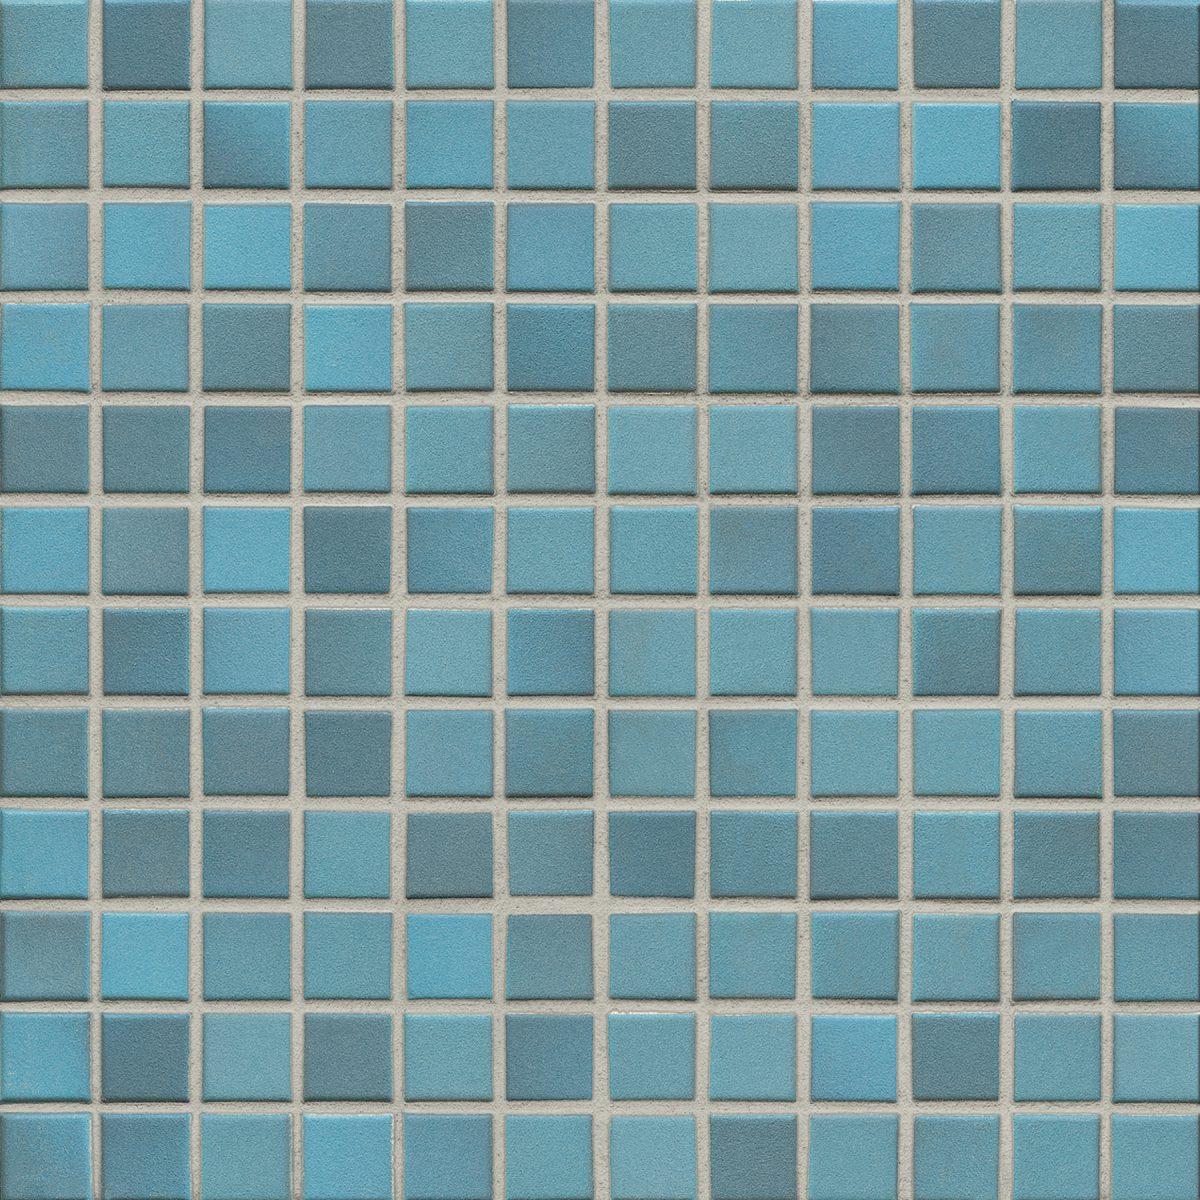 Мозаика серия Fresh 2,4 X 2,4 см Pacific Blue Mix Secura (противоскользящая R10/B)